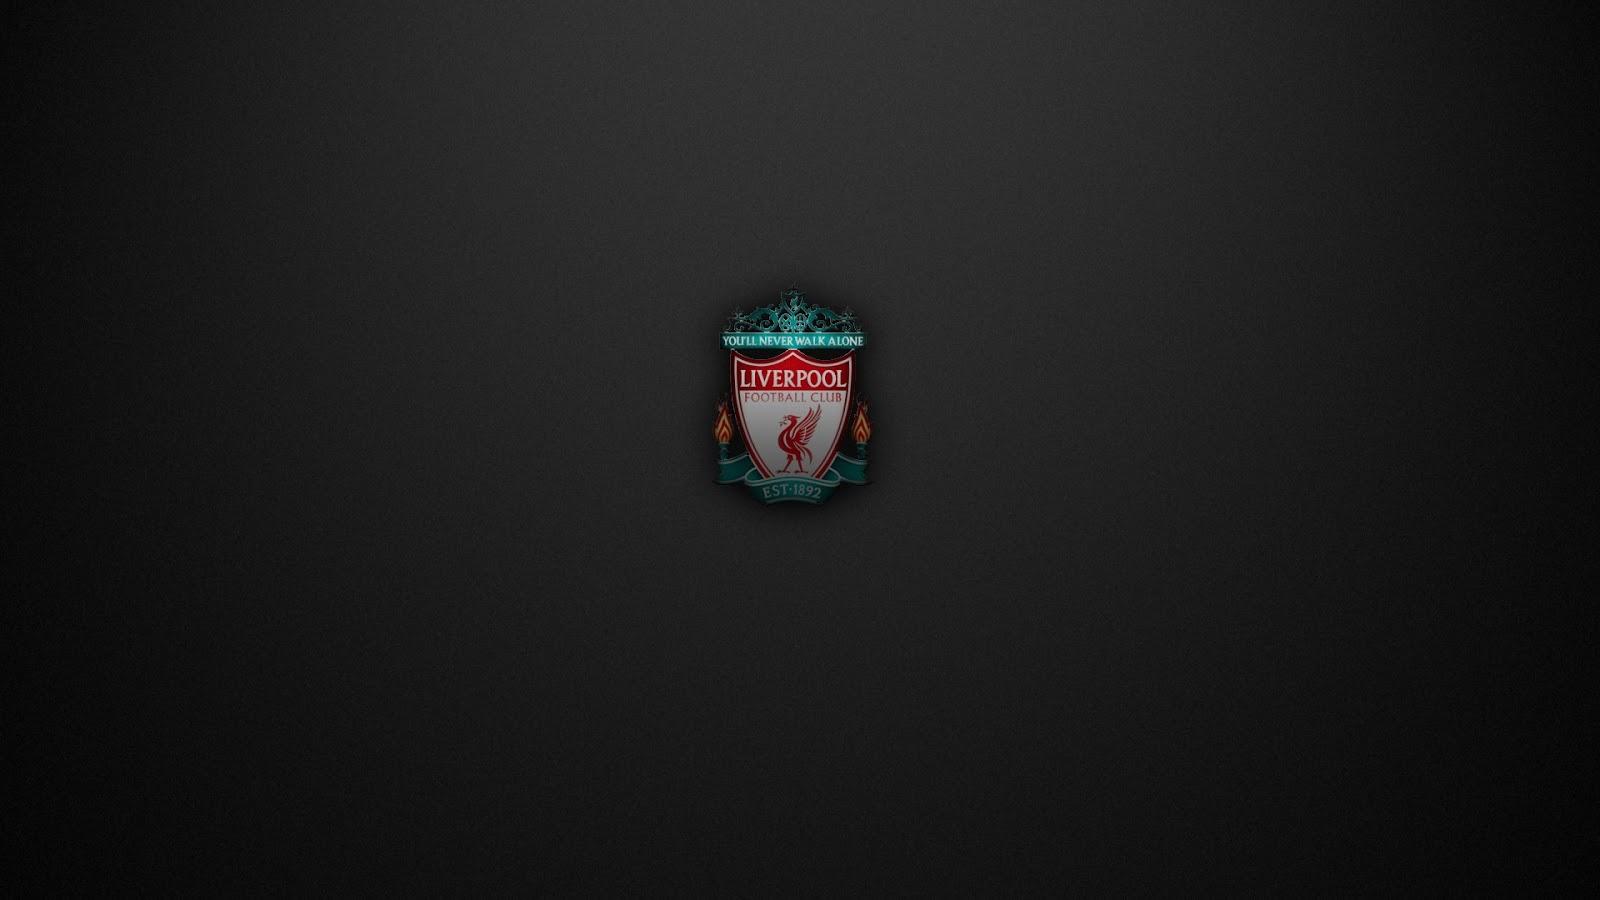 wallpapers hd for mac Liverpool FC Logo Wallpaper HD 2013 1600x900